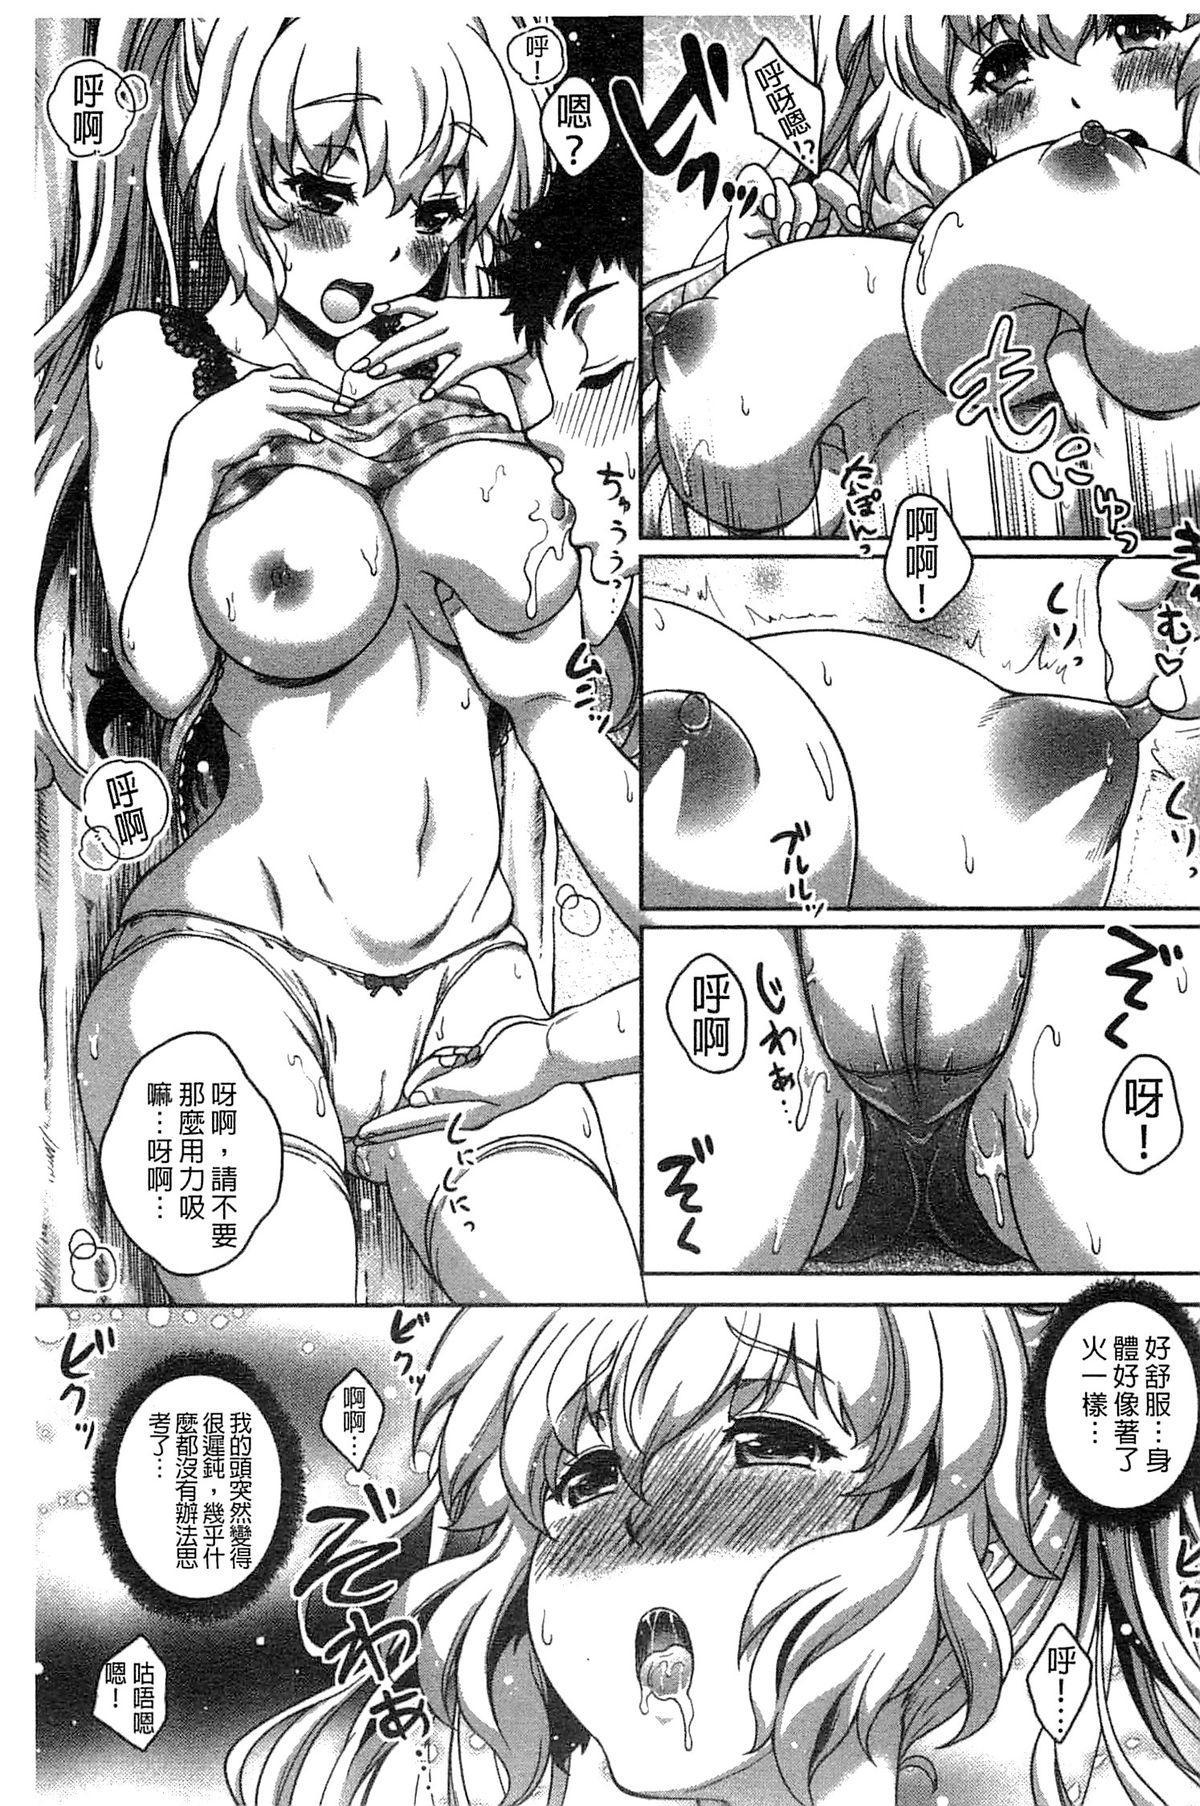 Hajimete nan dakara - First sexual experience 155